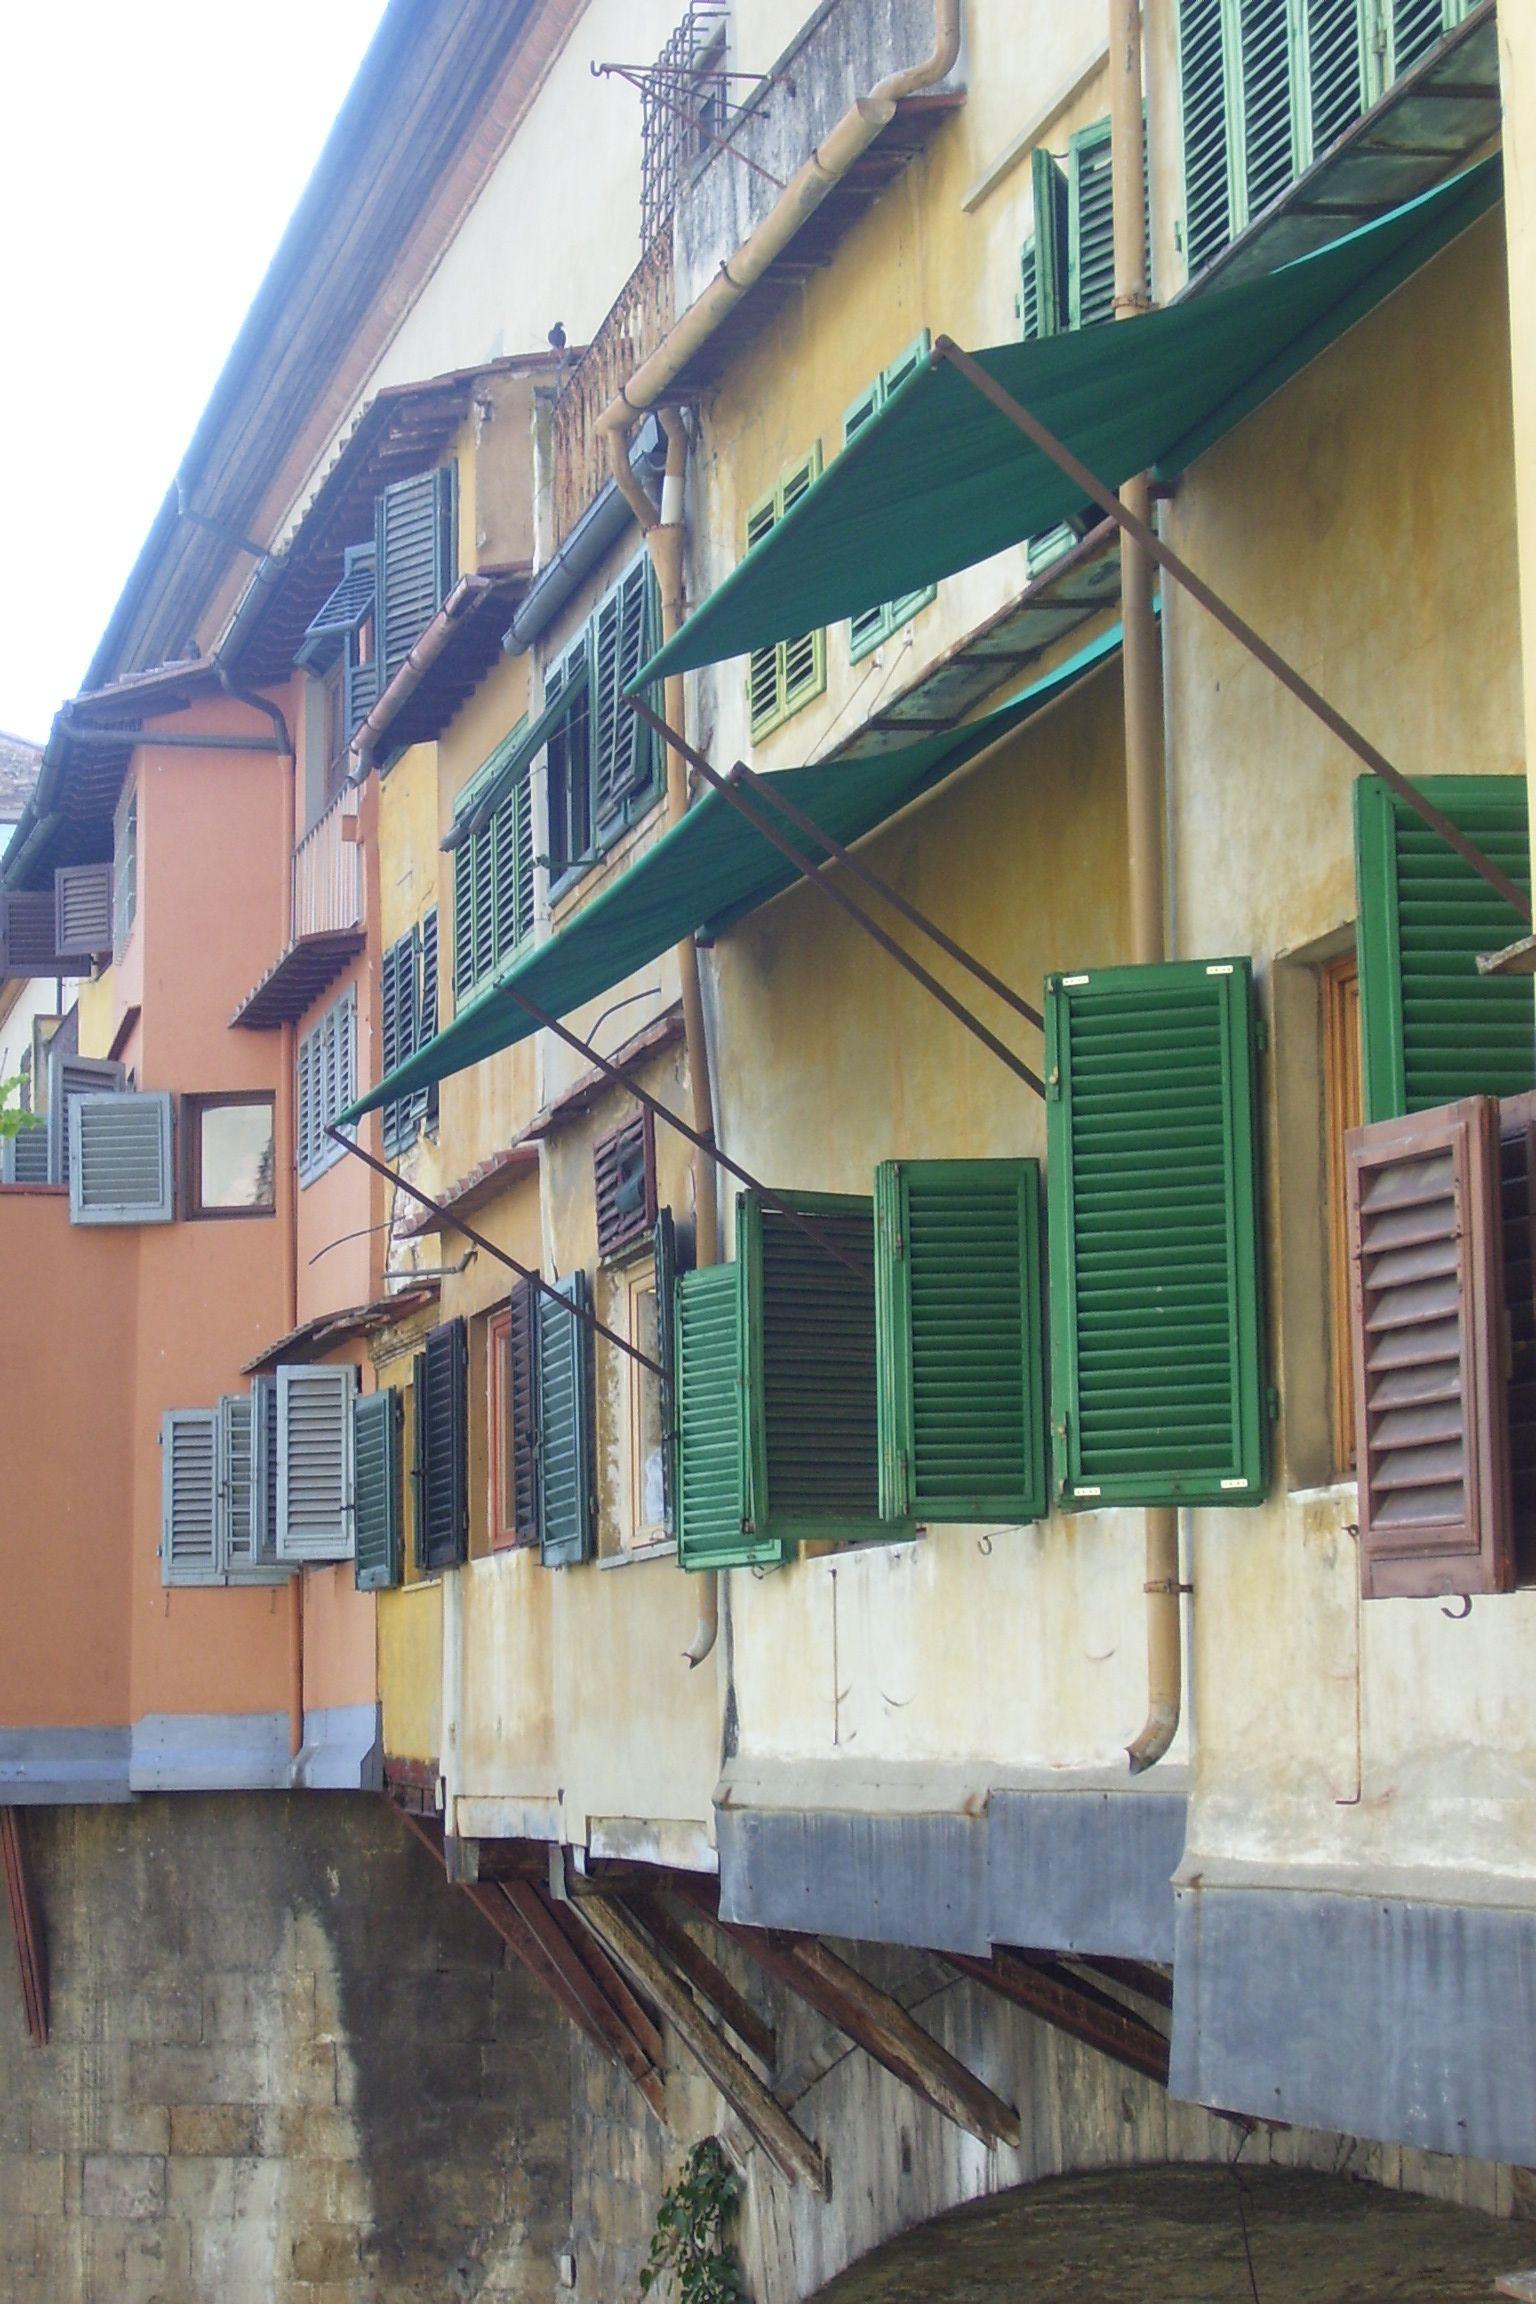 Shutters on the bridge - Italy